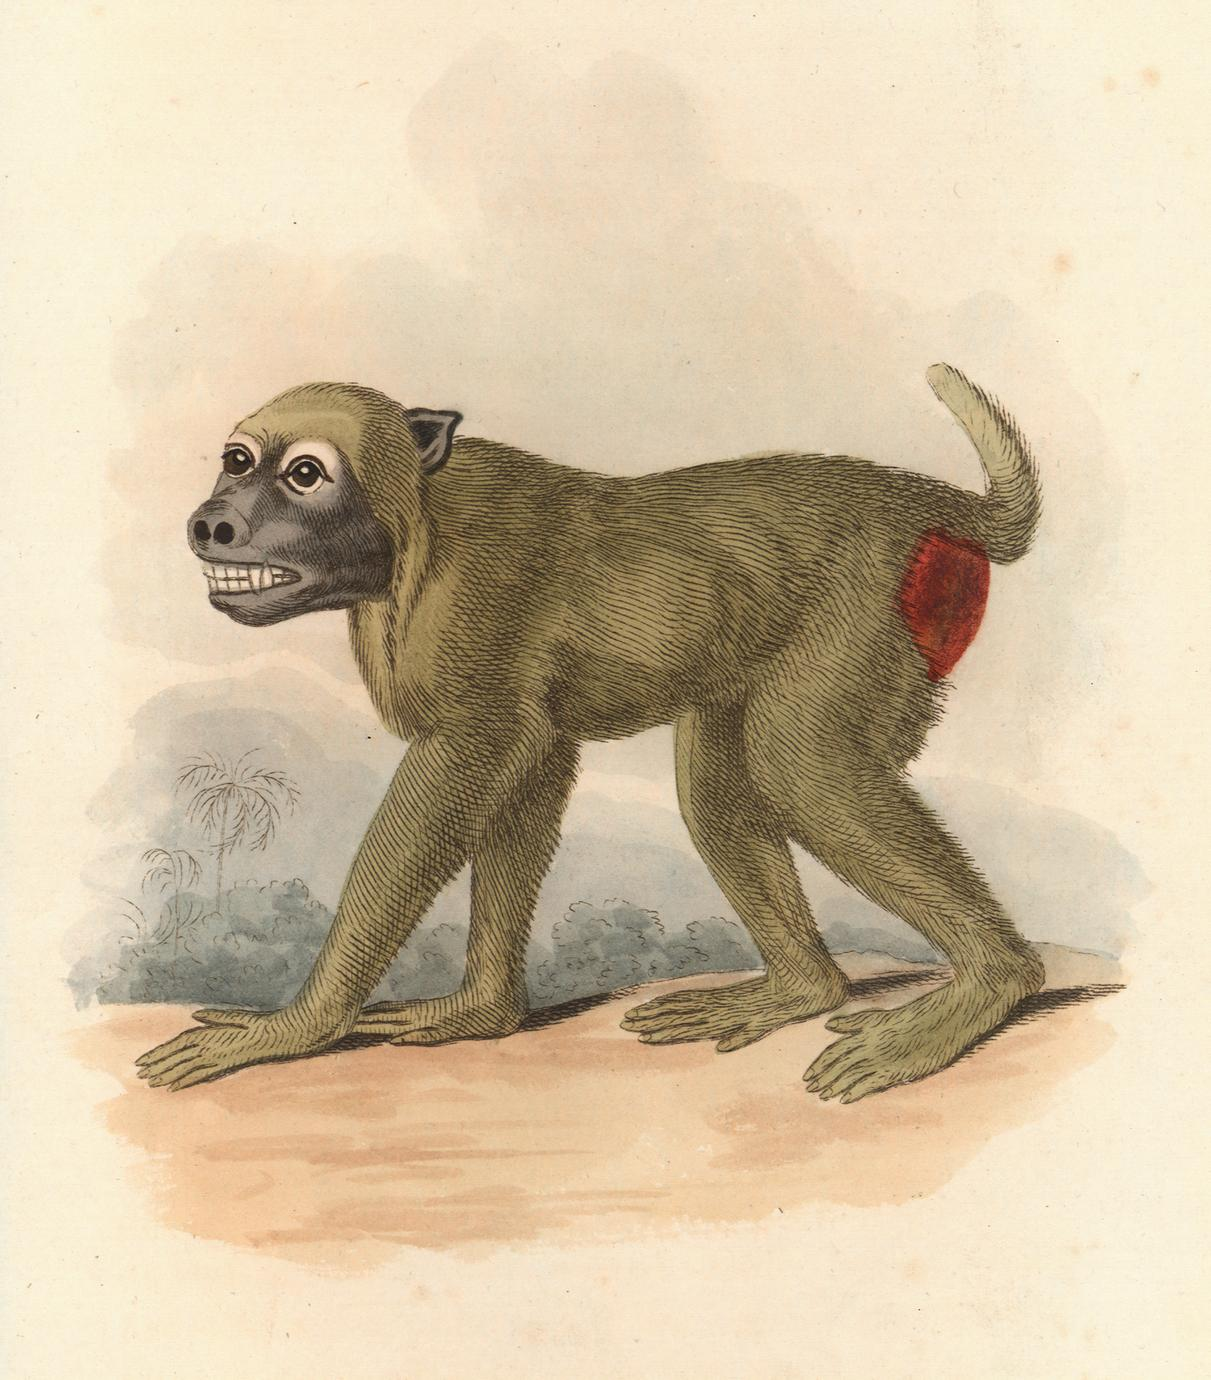 The Wood Baboon